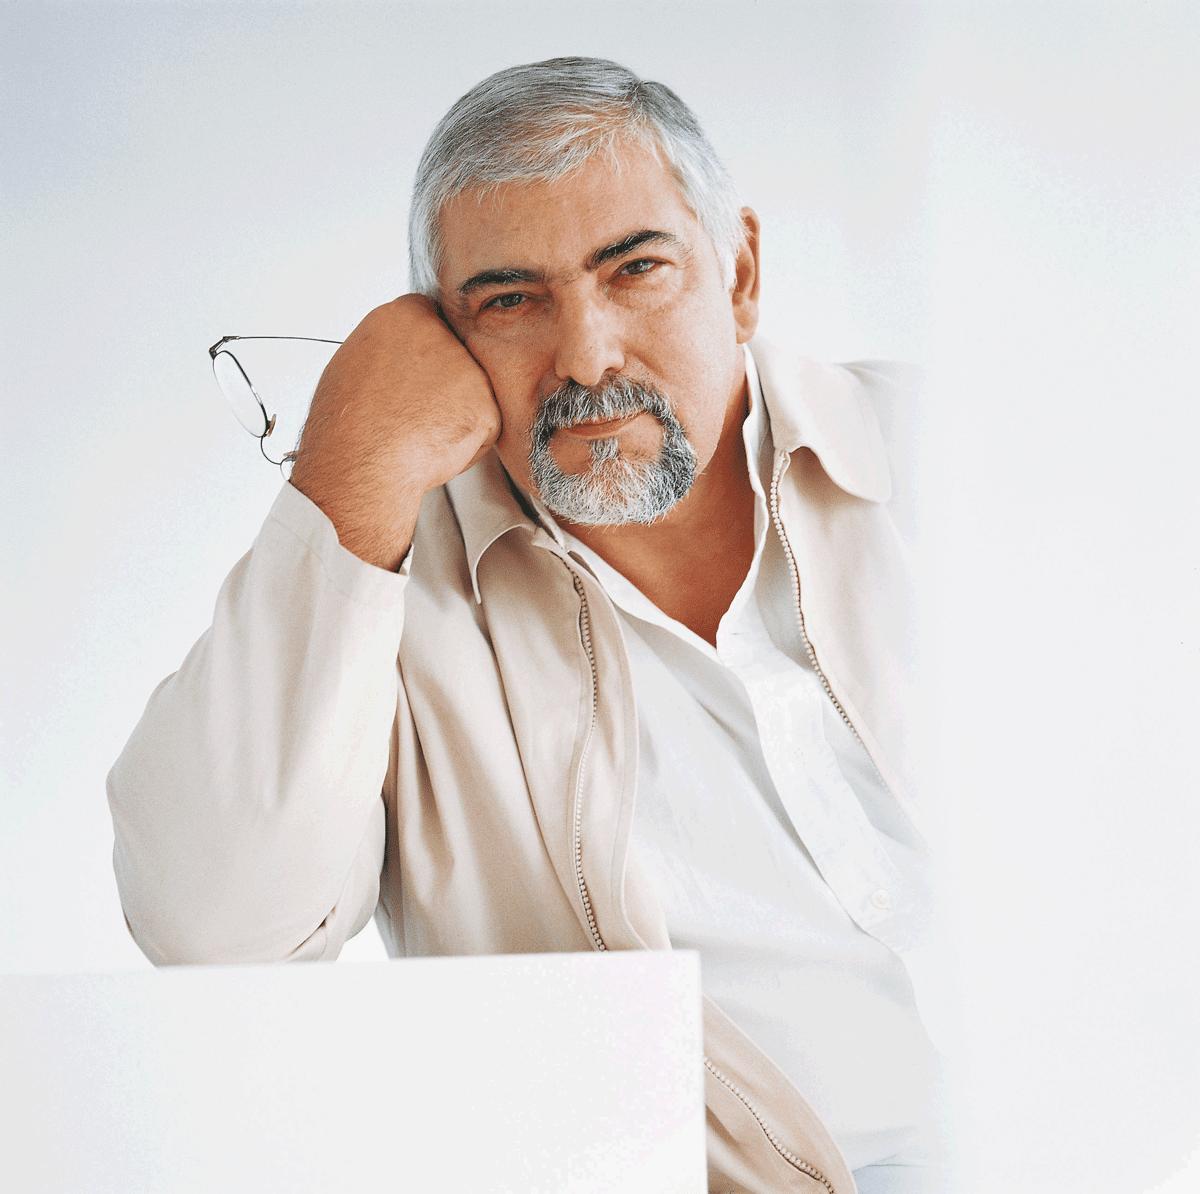 Jorge Bucay pensando en sus frases inspiradoras